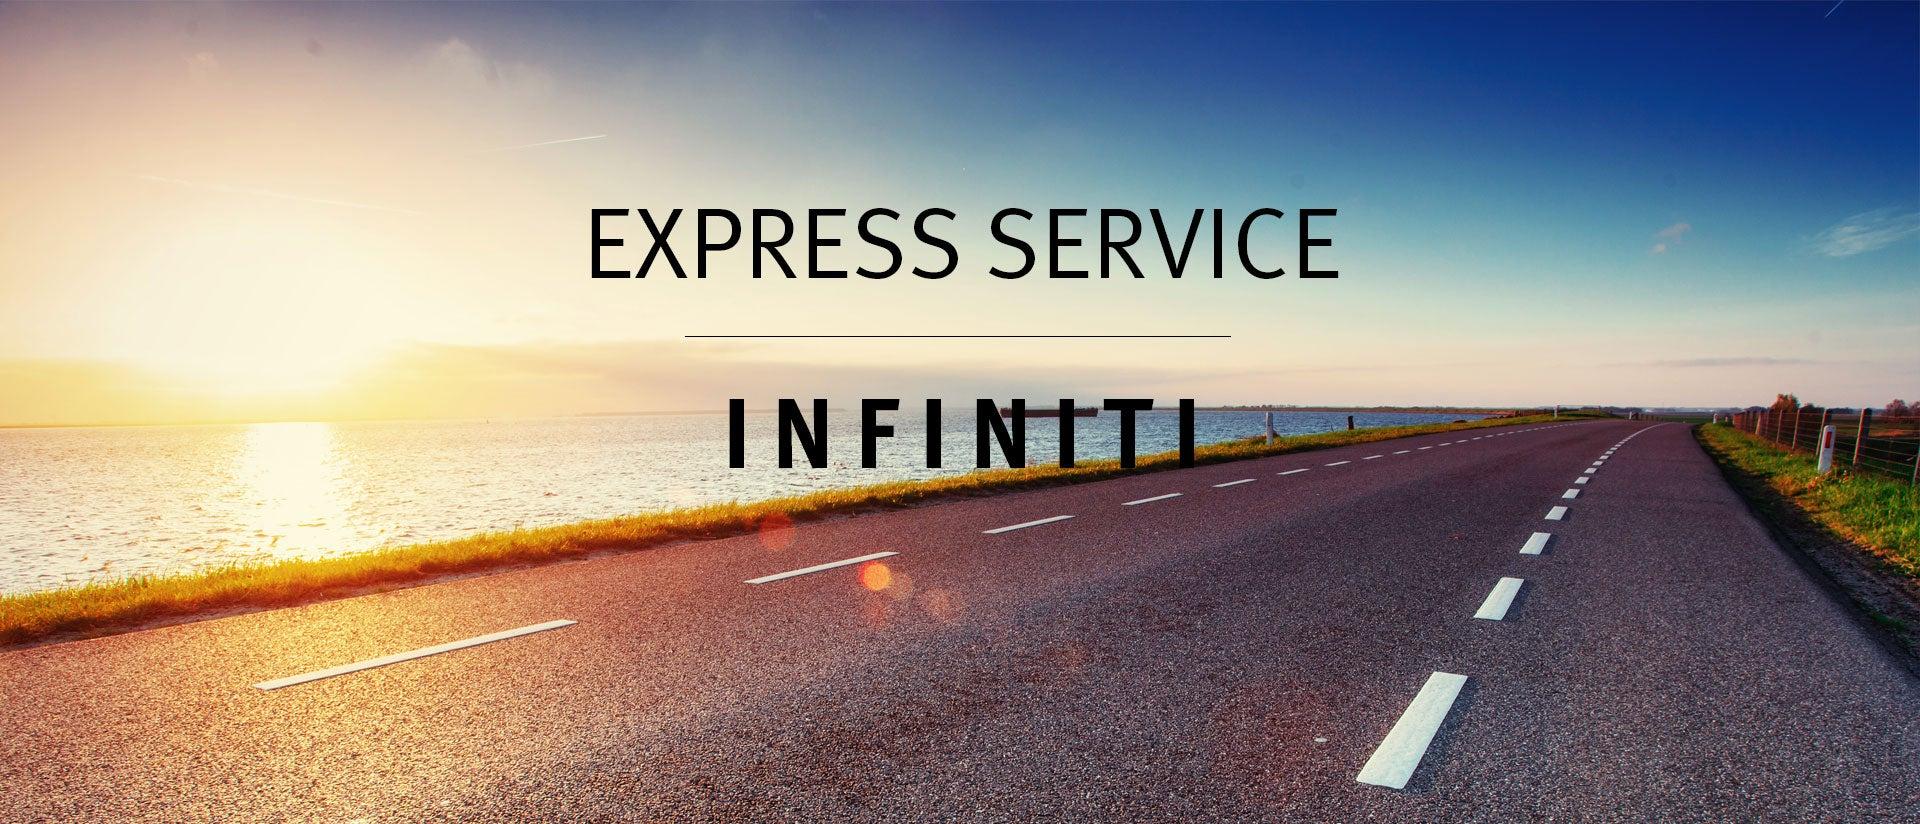 express service program express service program